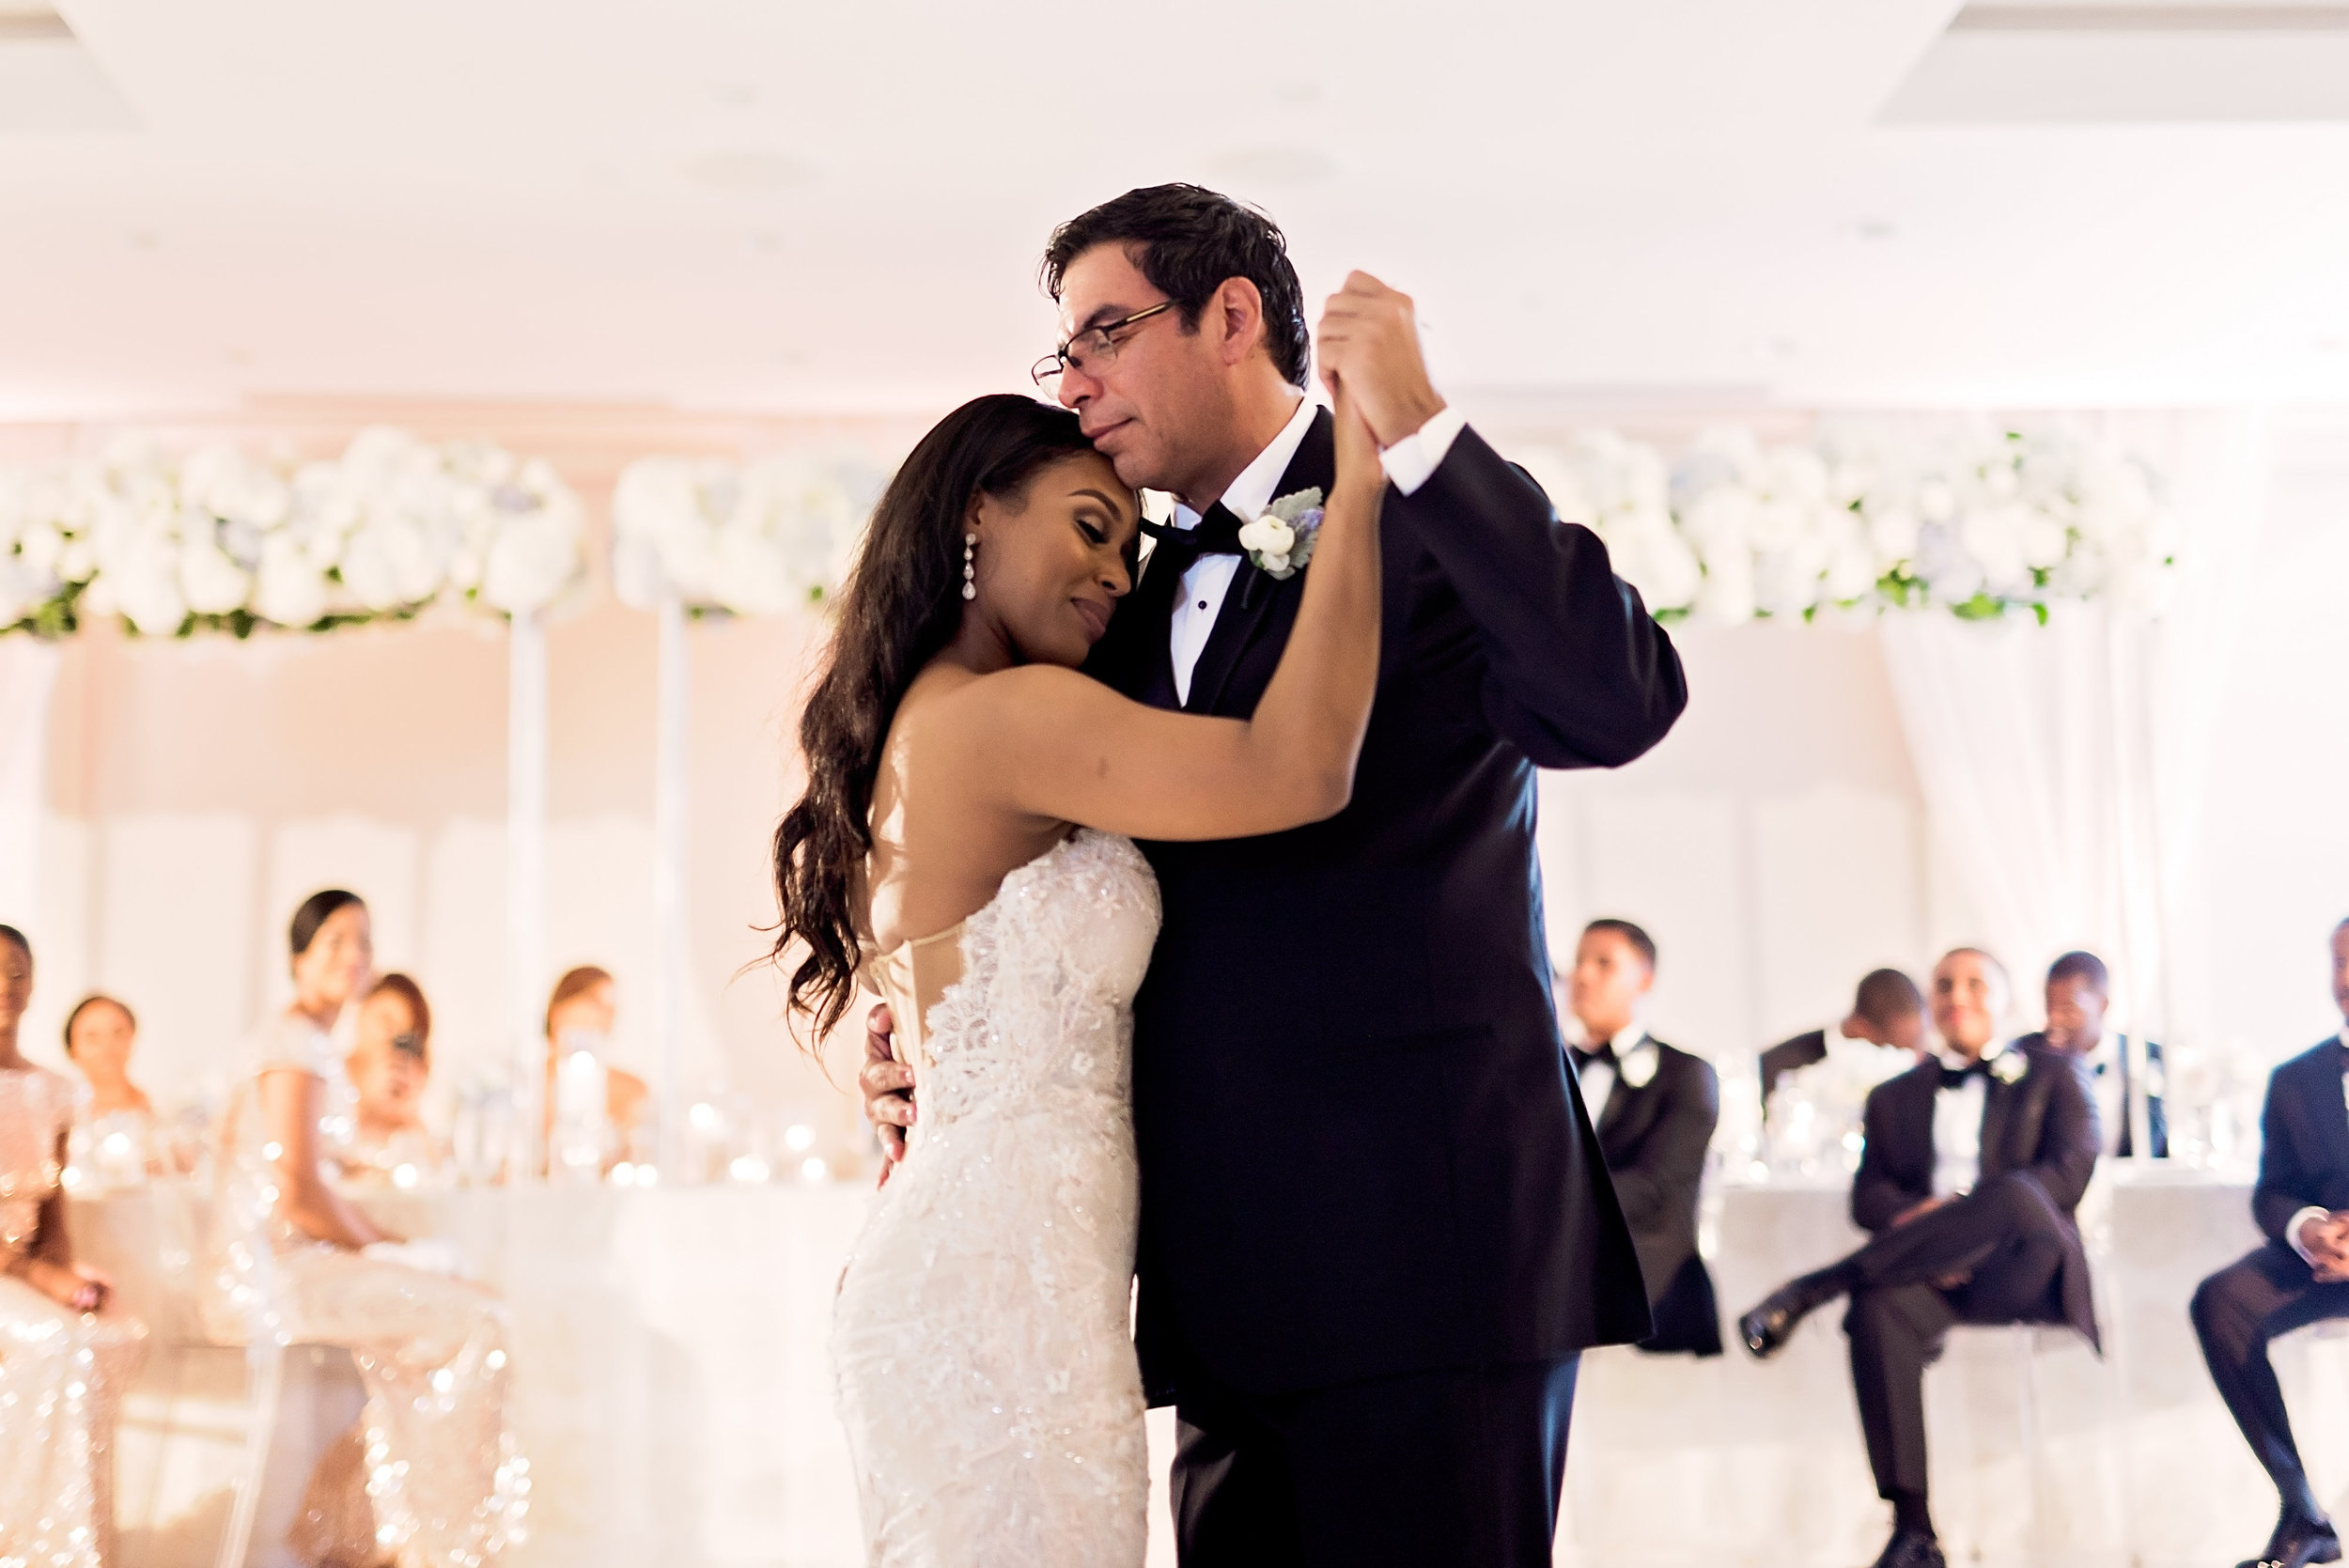 Enchanting-Wedding-Jessica-Quincy-Pharris-Photos103.jpg